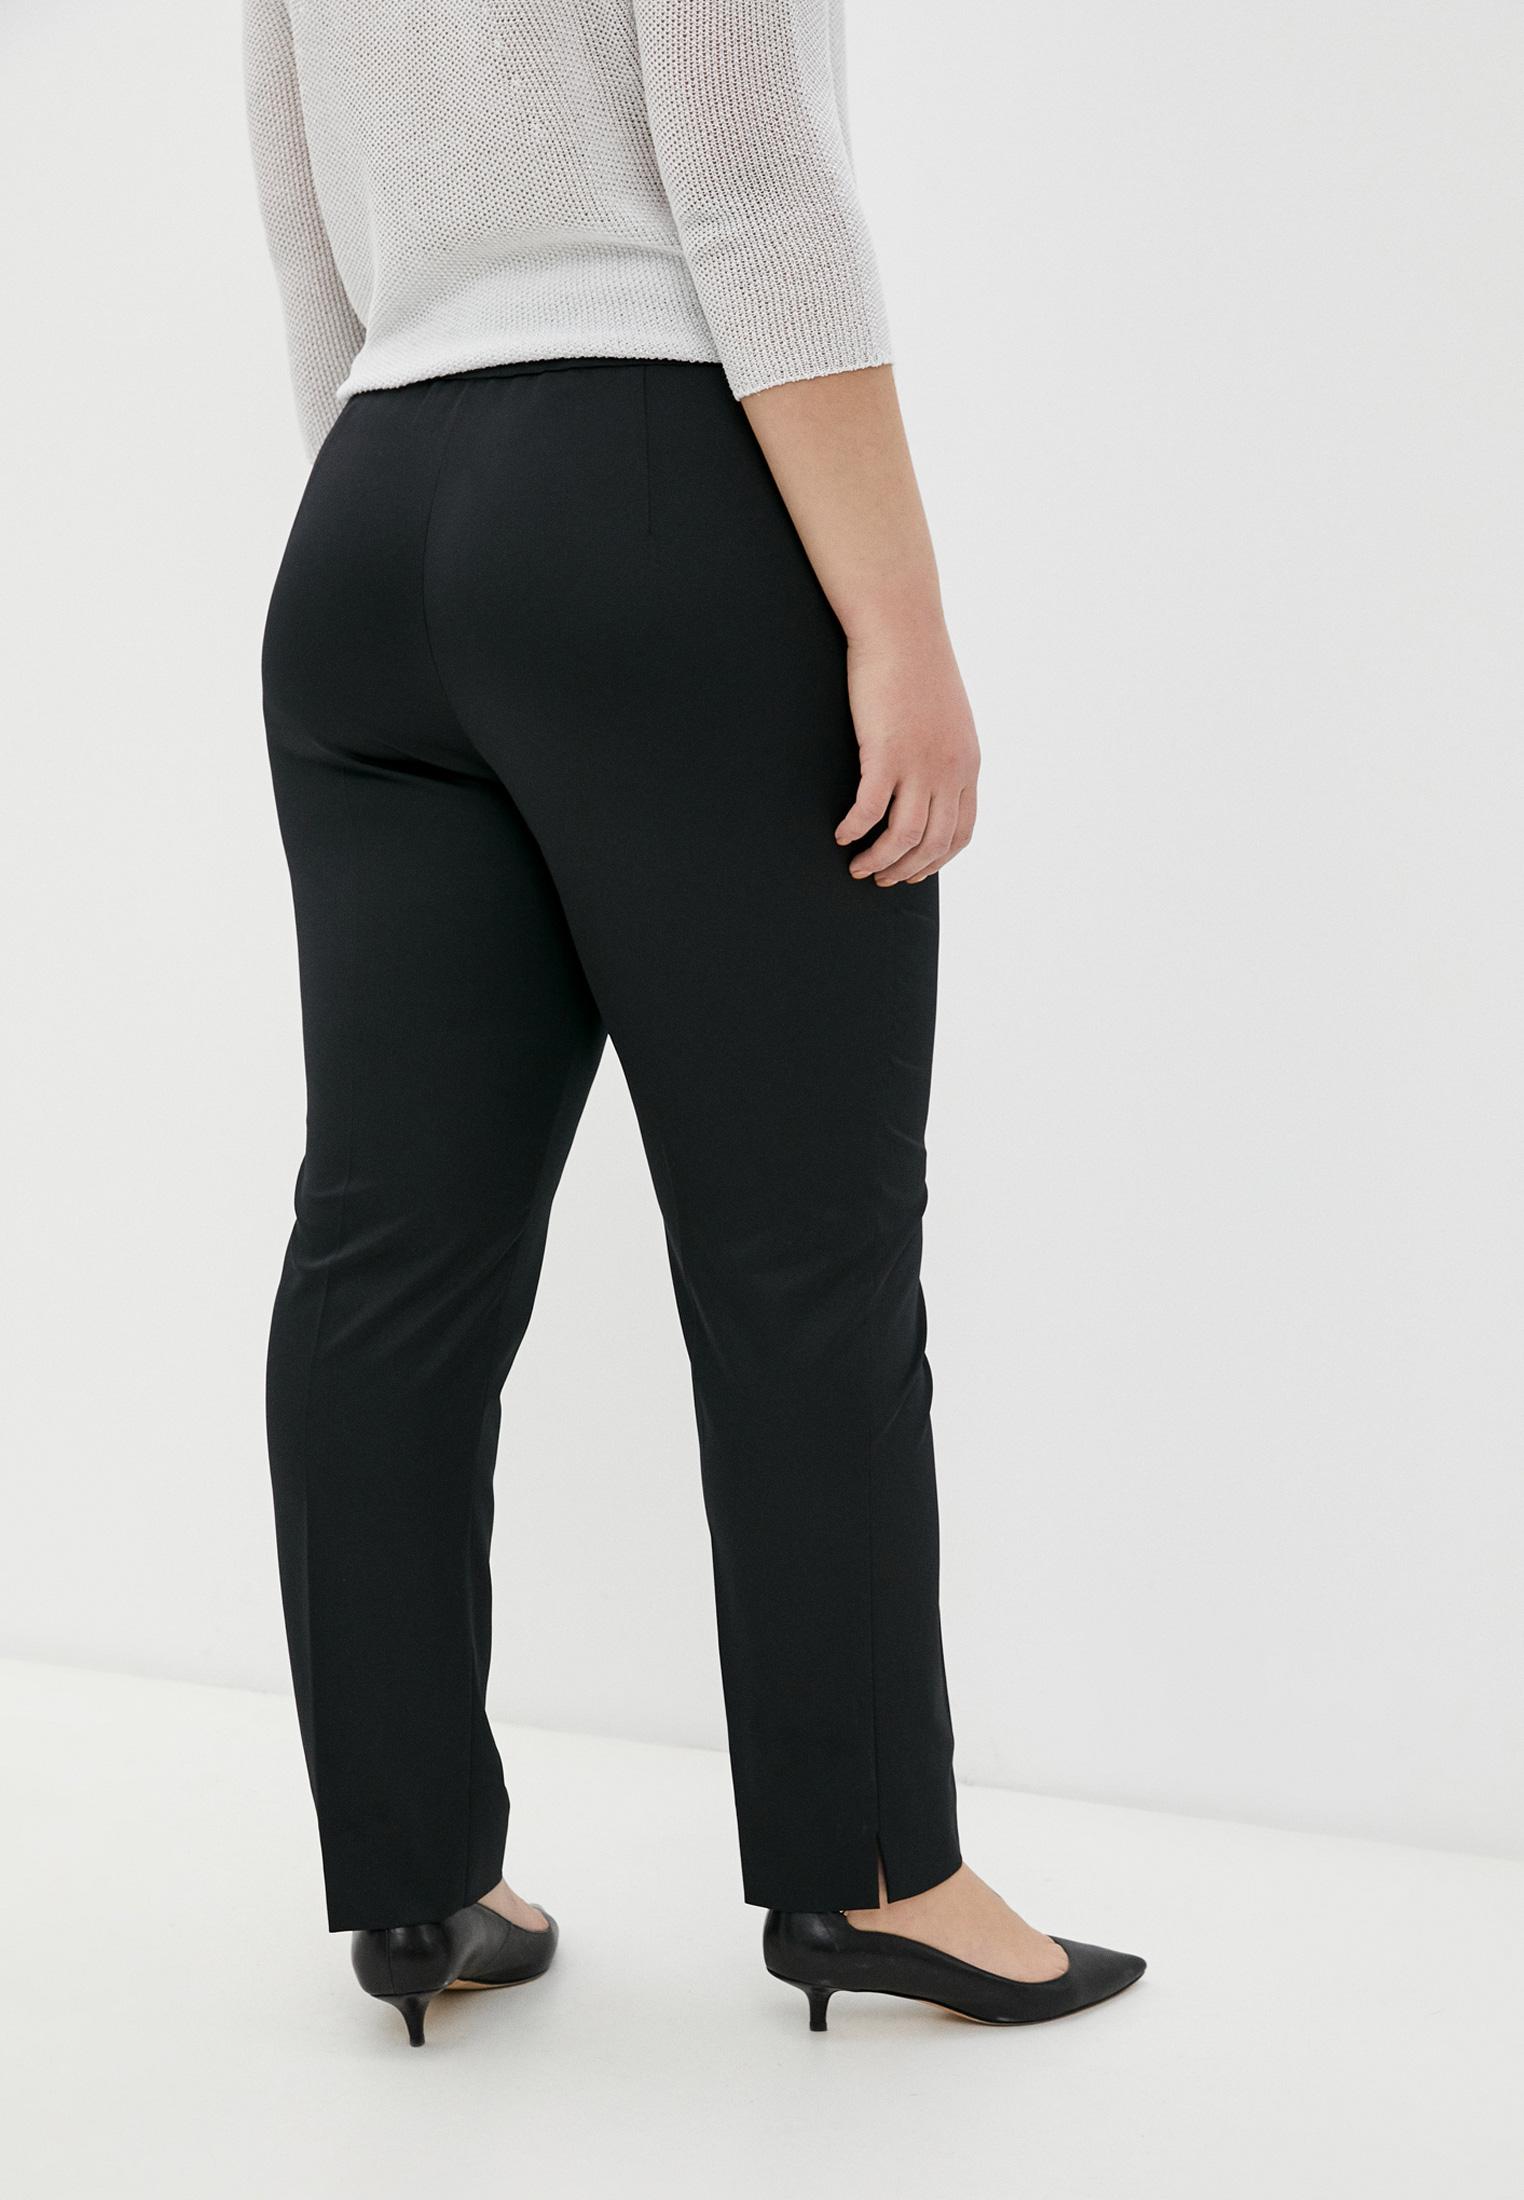 Женские классические брюки Persona by Marina Rinaldi 1131301: изображение 4